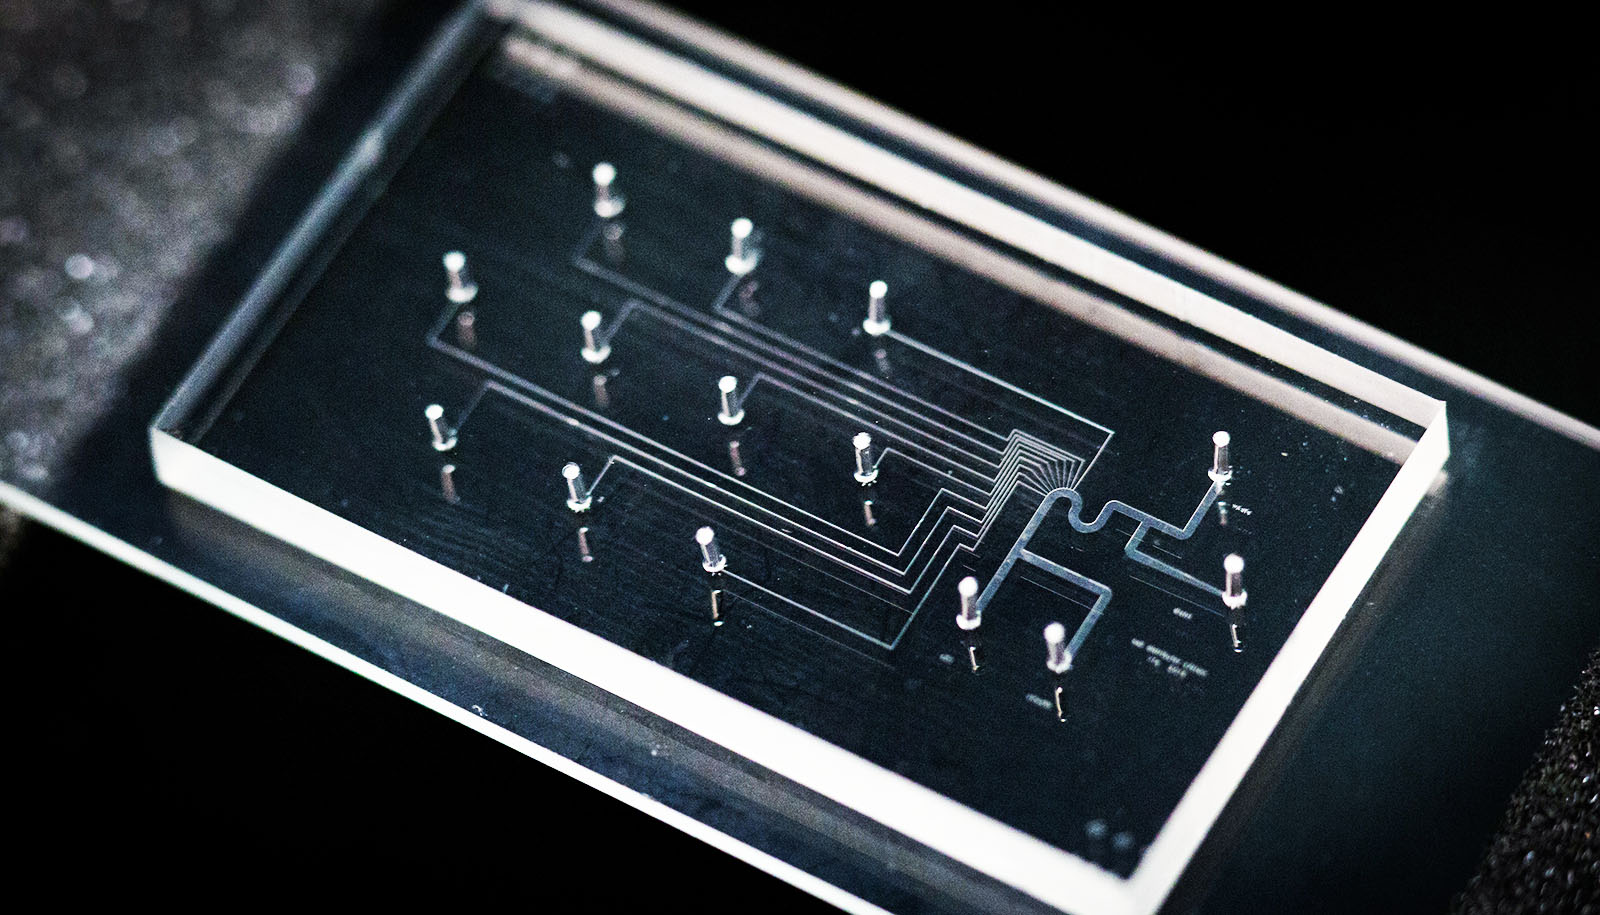 Microfluidic_chip_1600